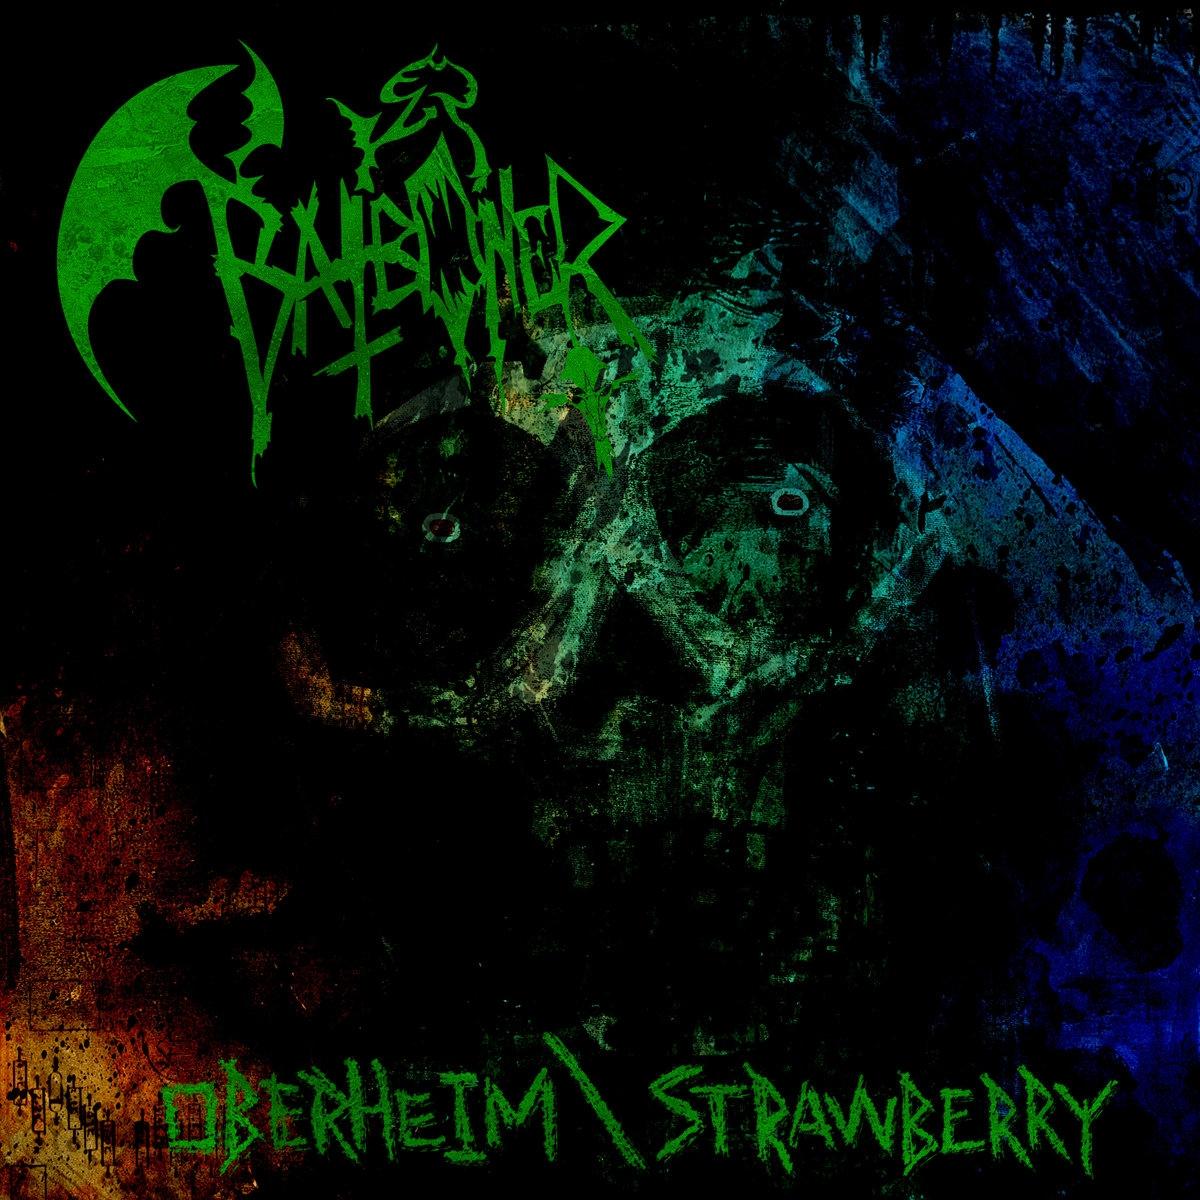 Batboner, Oberheim\Strawberry